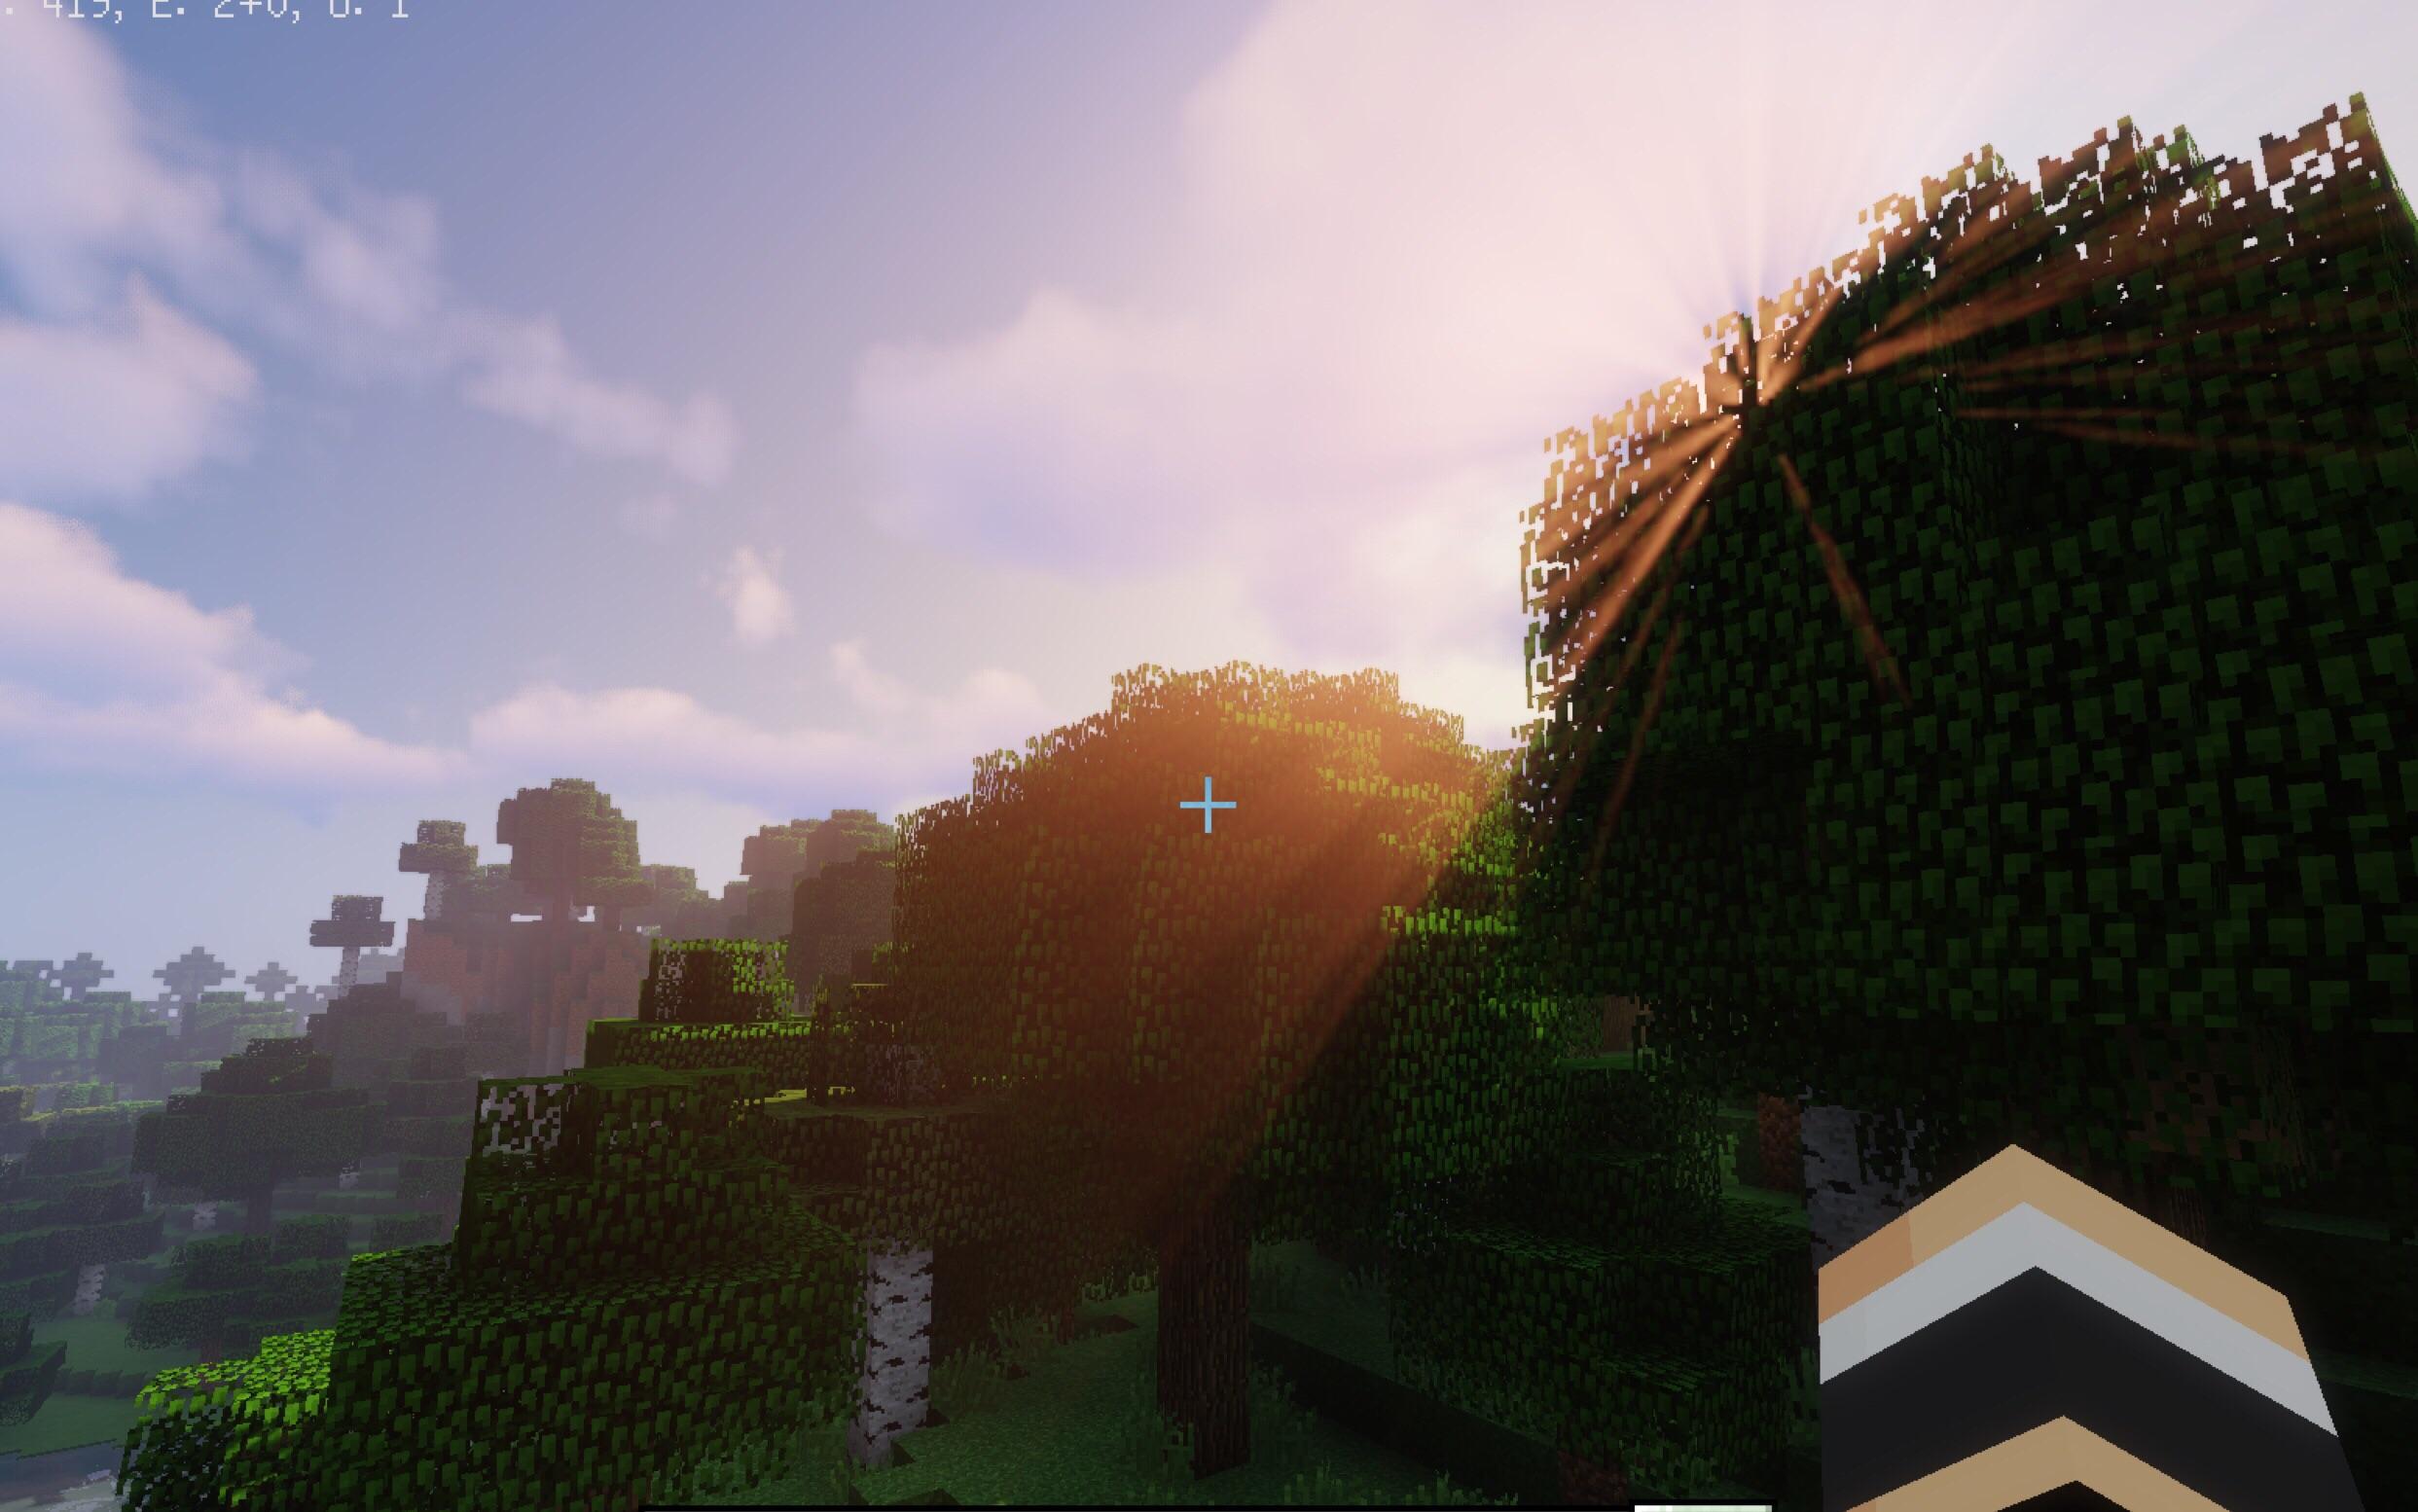 【光影和材質推薦】《Minecraft PE》竟然有這么好看的光影和材質3_嗶哩嗶哩 (゜-゜)つロ 干杯~-bilibili